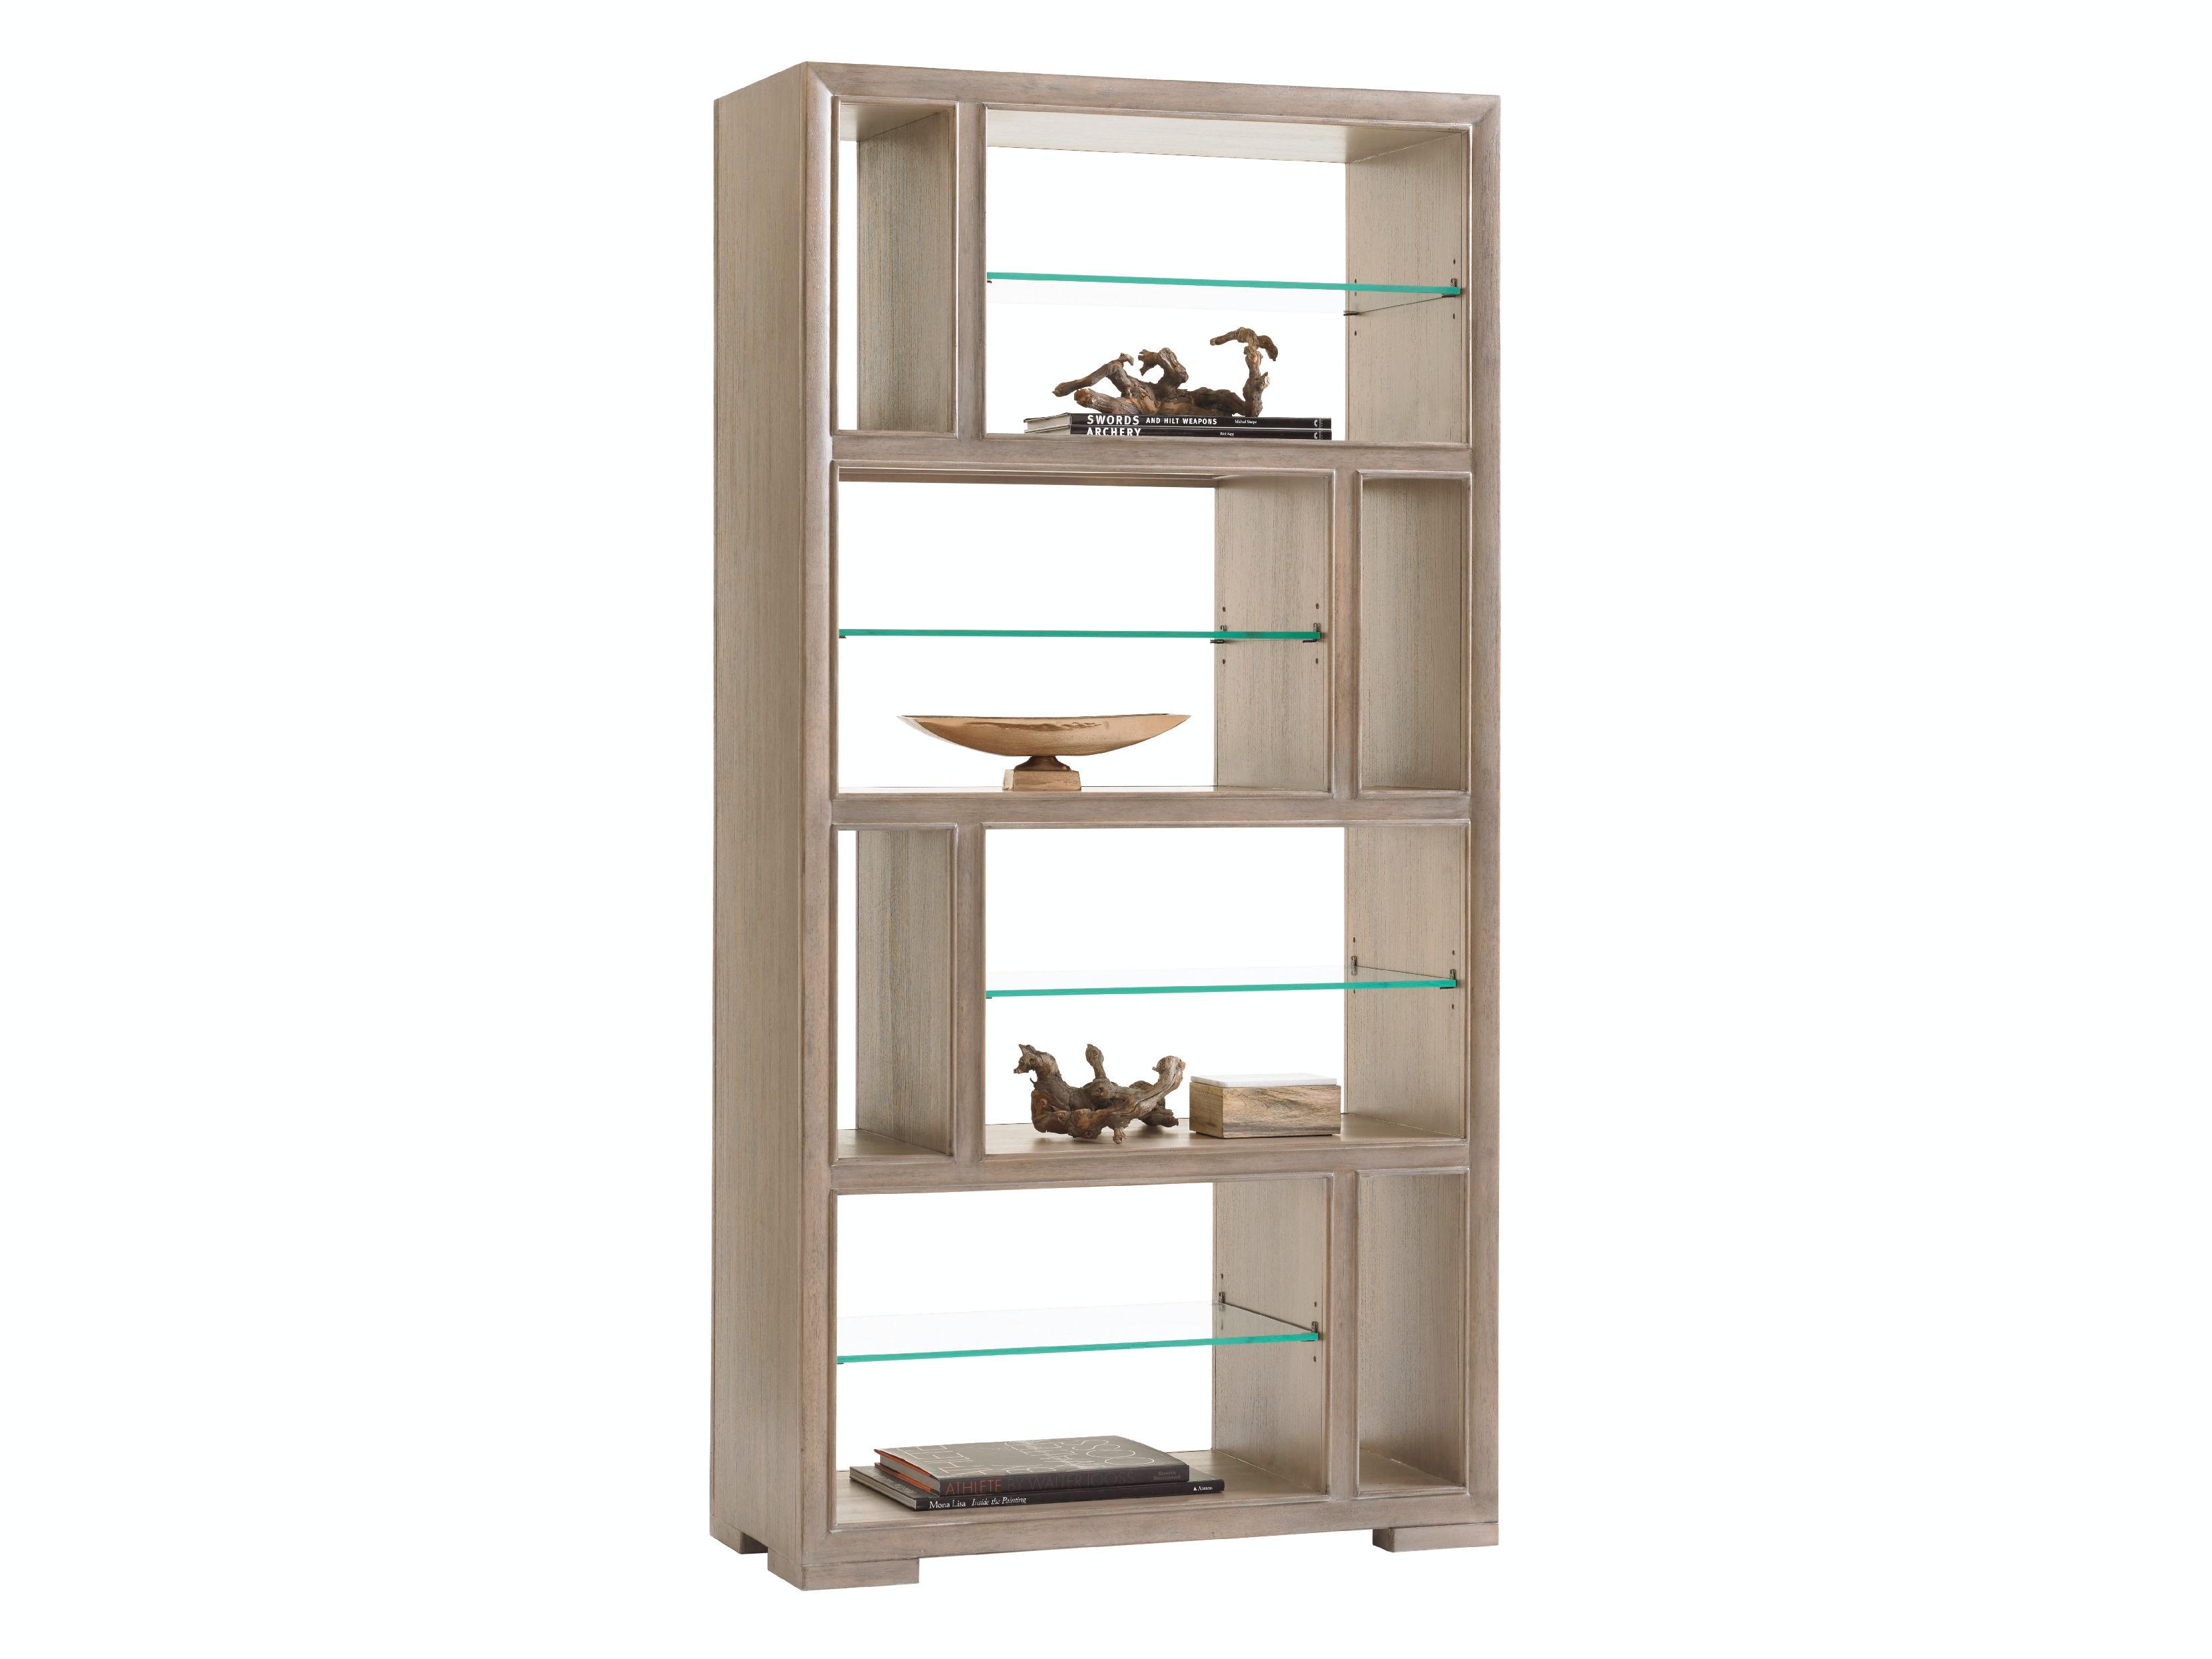 Lexington Home Office Windsor Open Bookcase Lx725991 Walter E Smithe Furniture Design